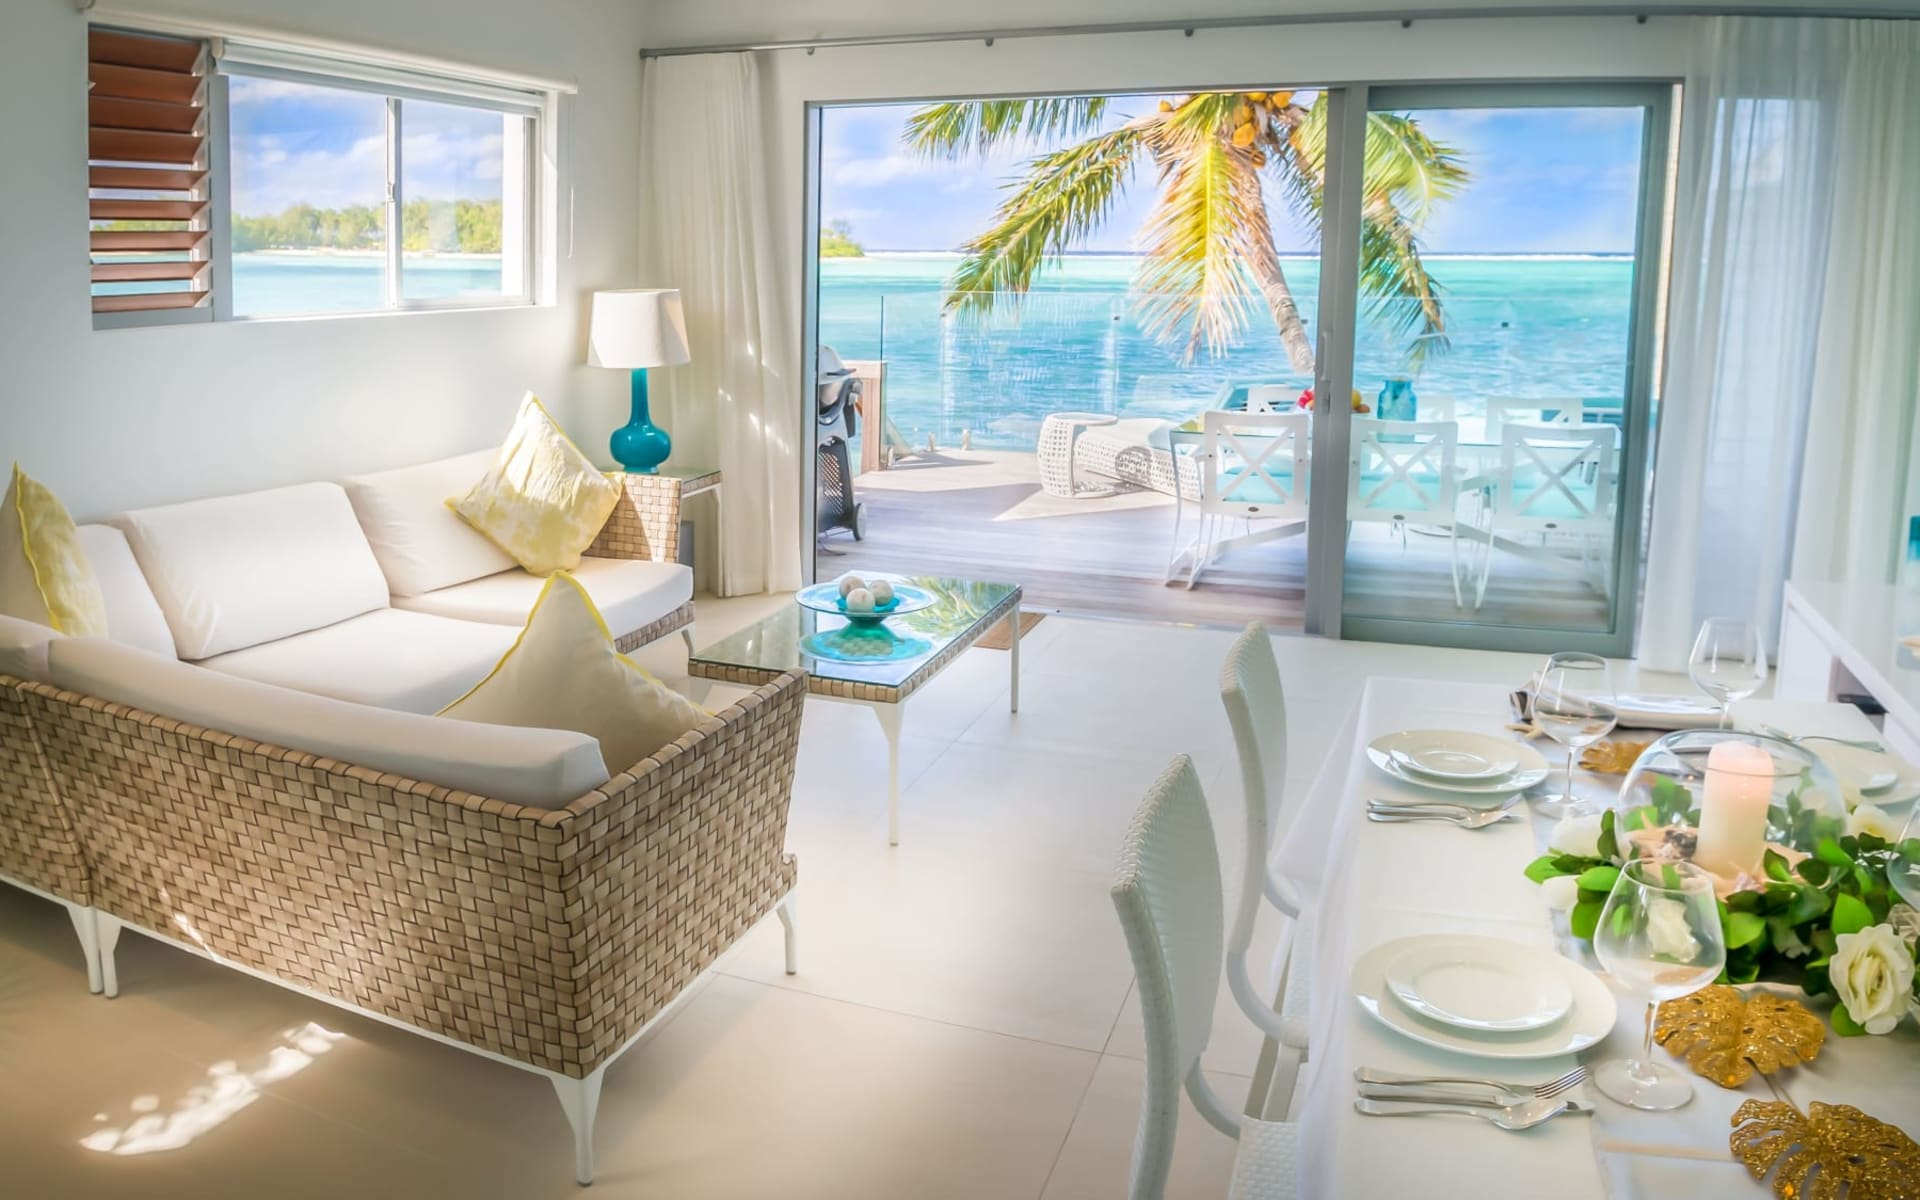 Crystal Blue Lagoon Villas in Rarotonga:  Crystal-Blue-Lagoon-Luxury-Villas